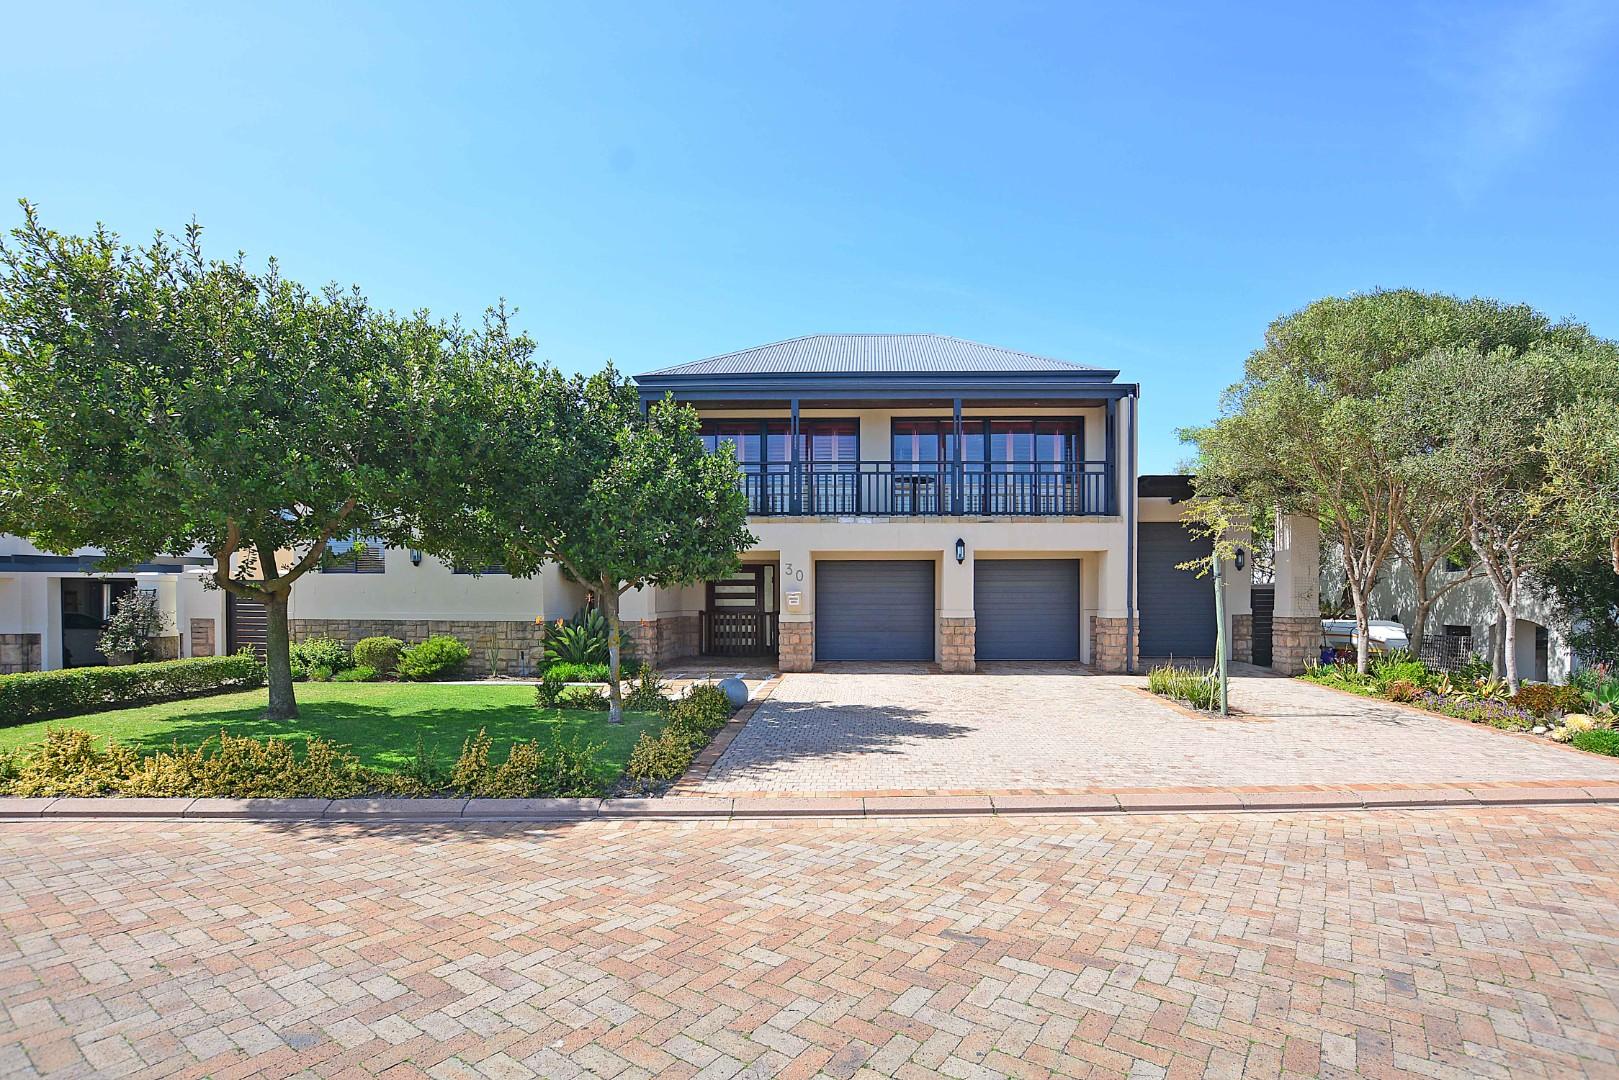 6 Bedroom House For Sale in Atlantic Beach Golf Estate